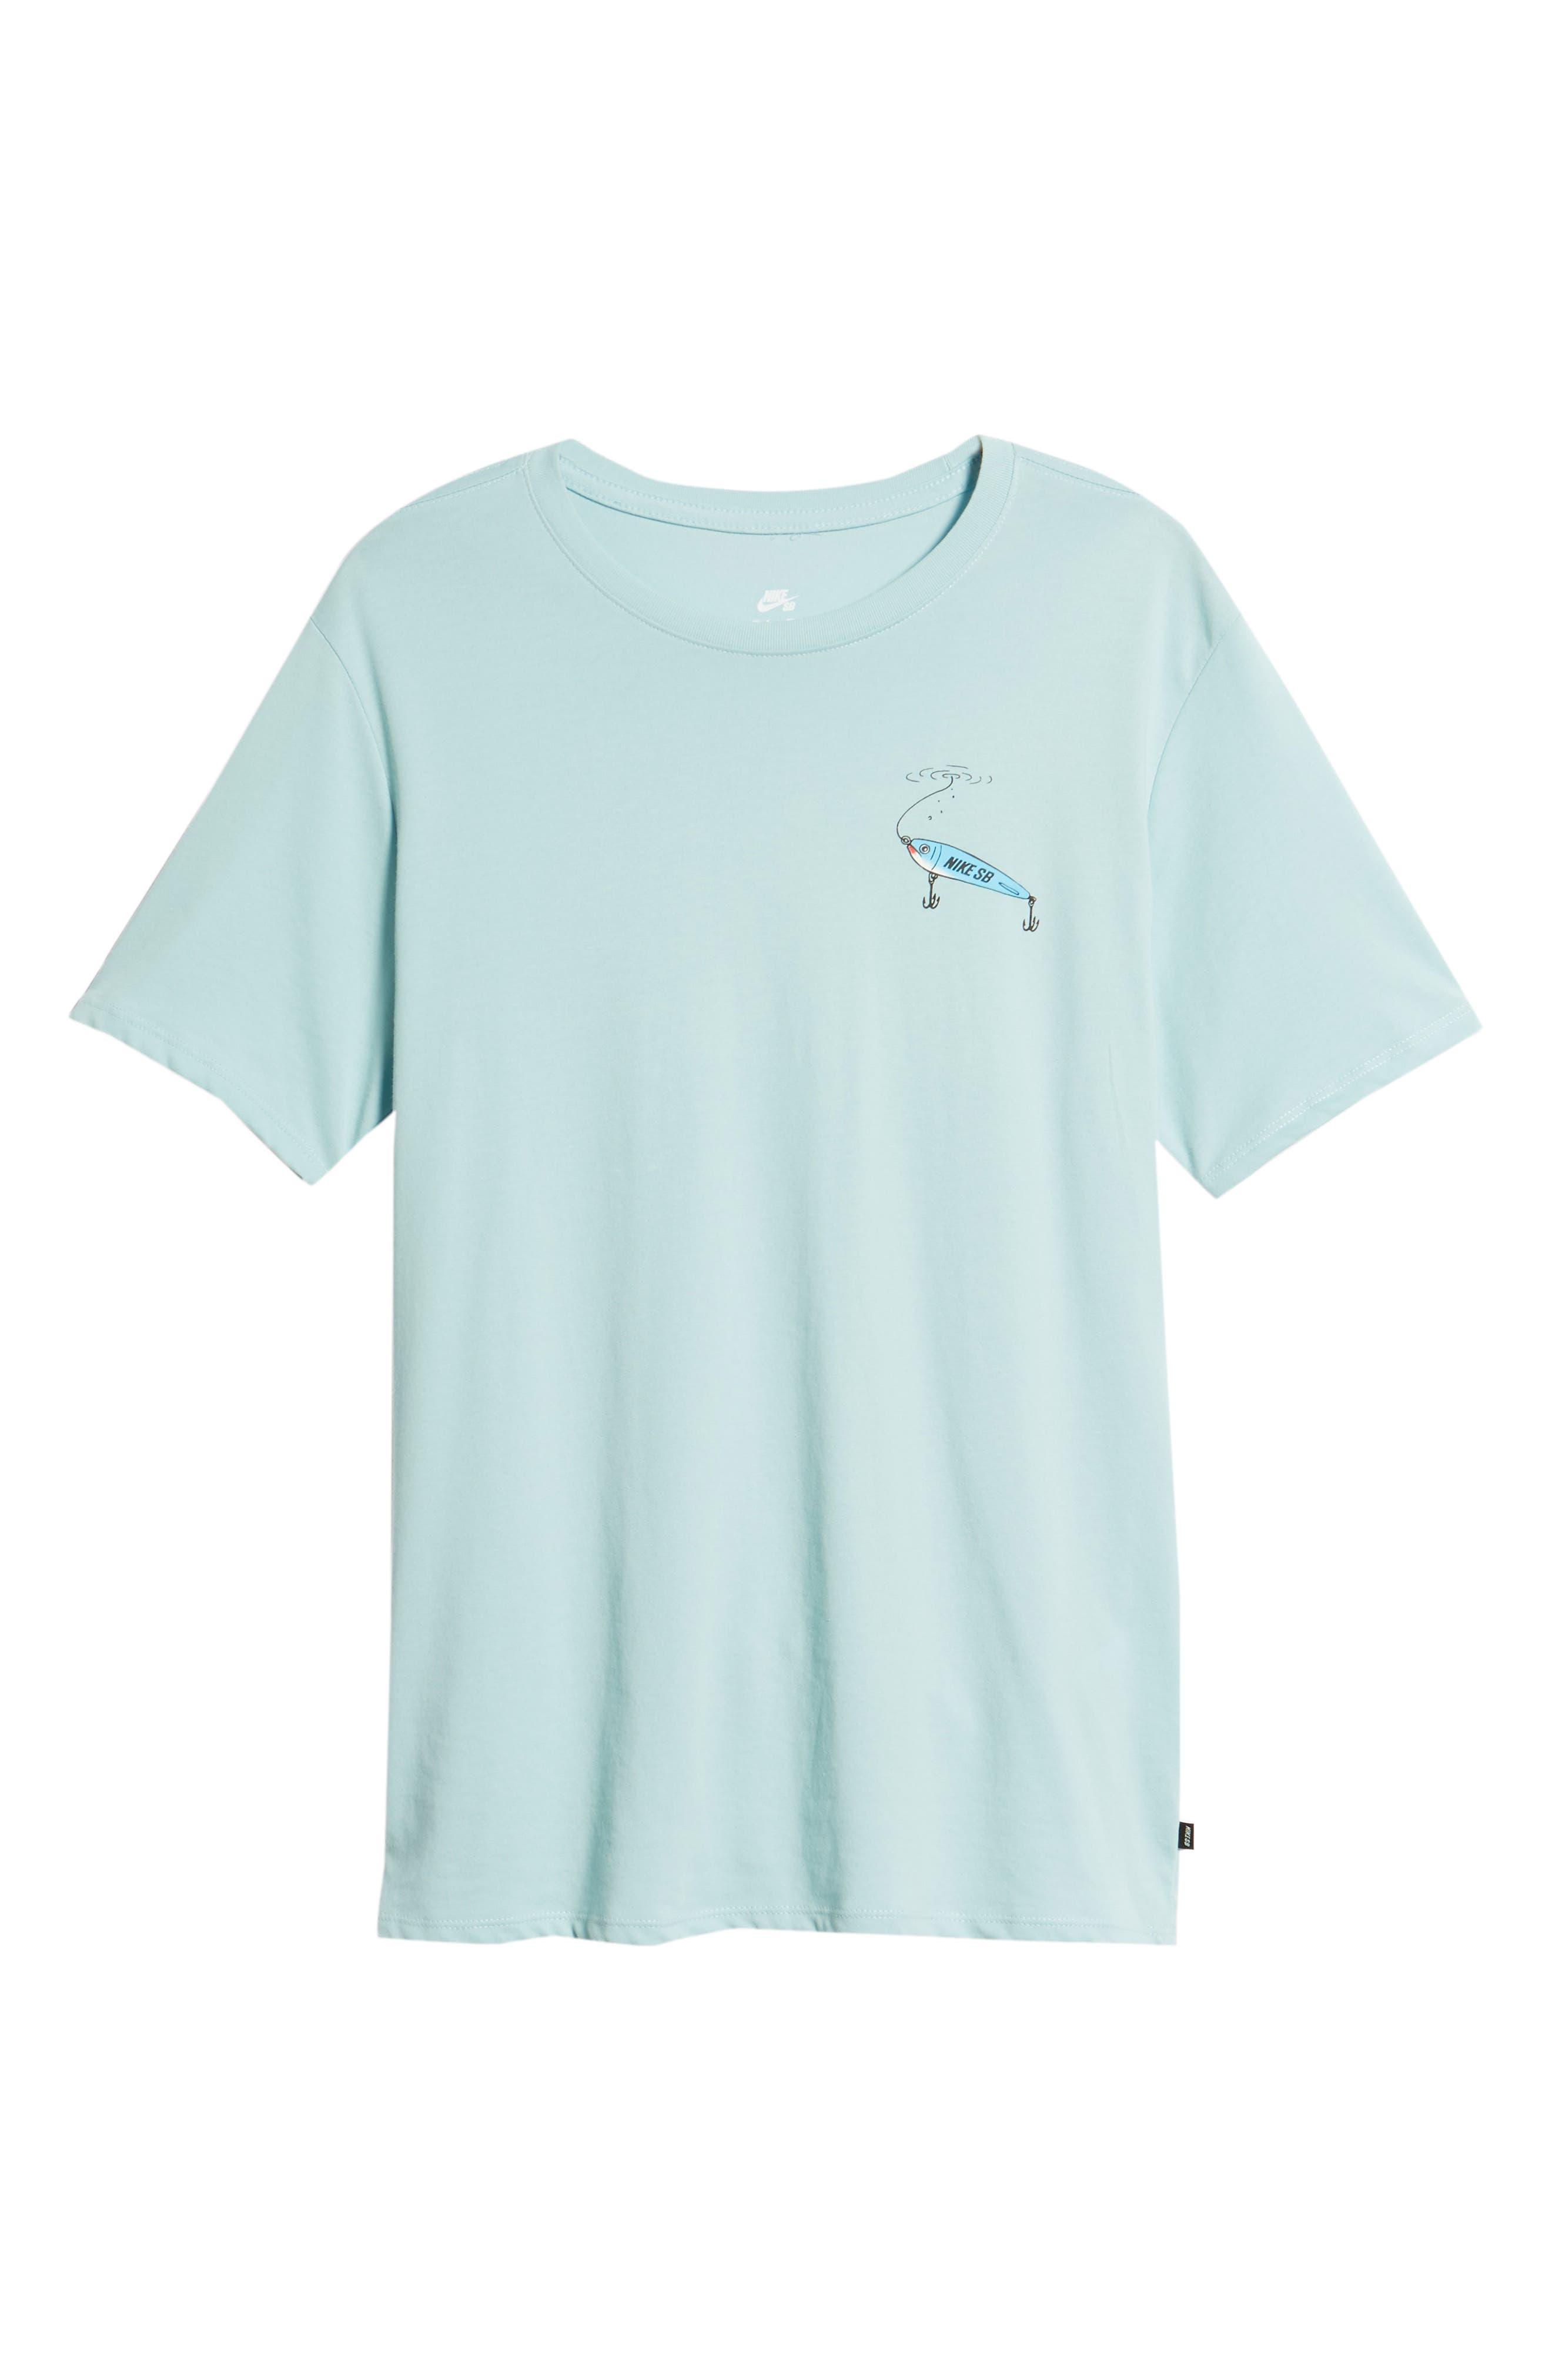 Dry Walrus T-Shirt,                             Alternate thumbnail 6, color,                             Ocean Bliss/ Black